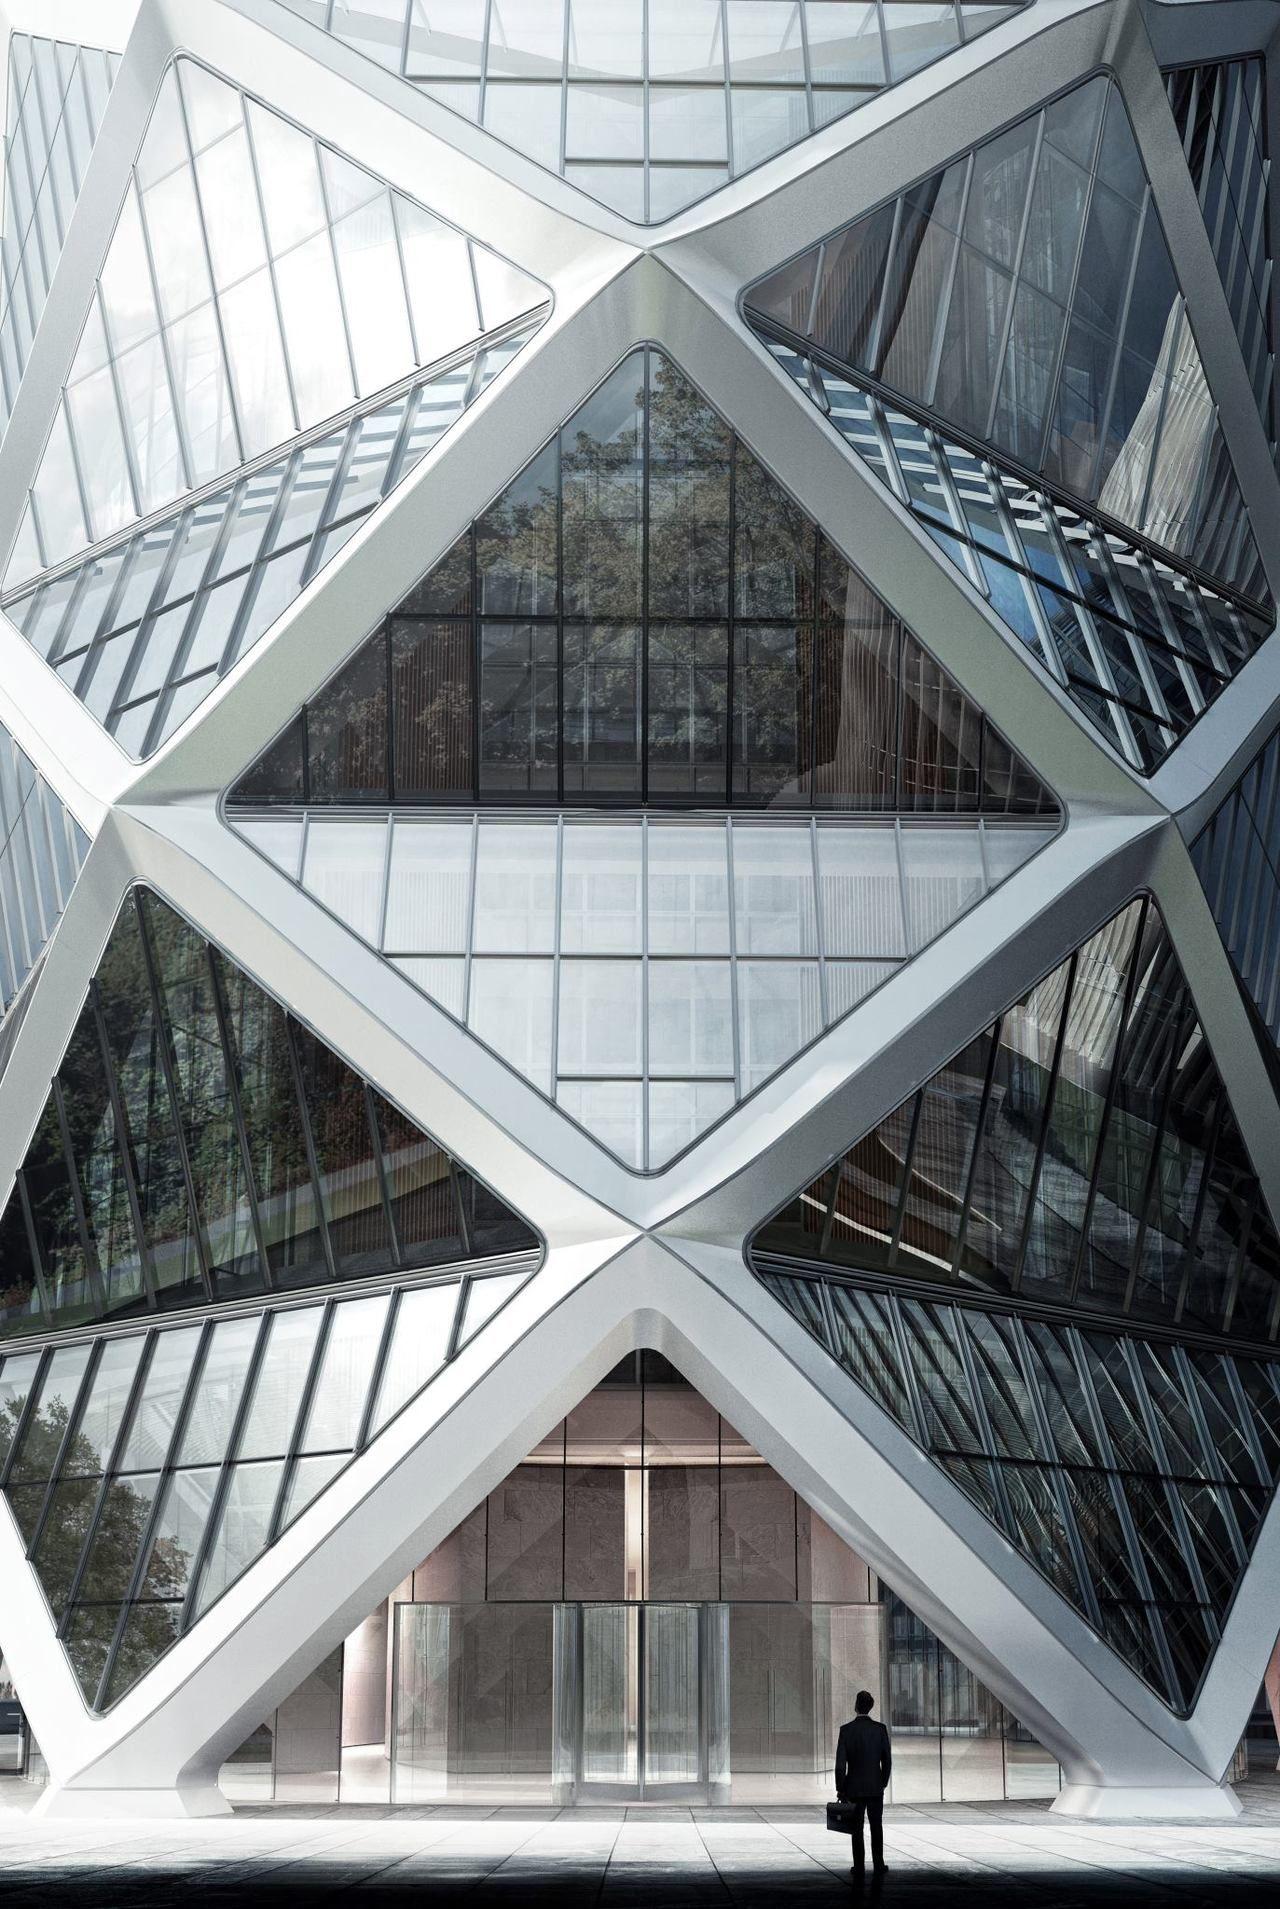 Estructura triangular ventanas tipos de estructuras - Fachadas arquitectura ...